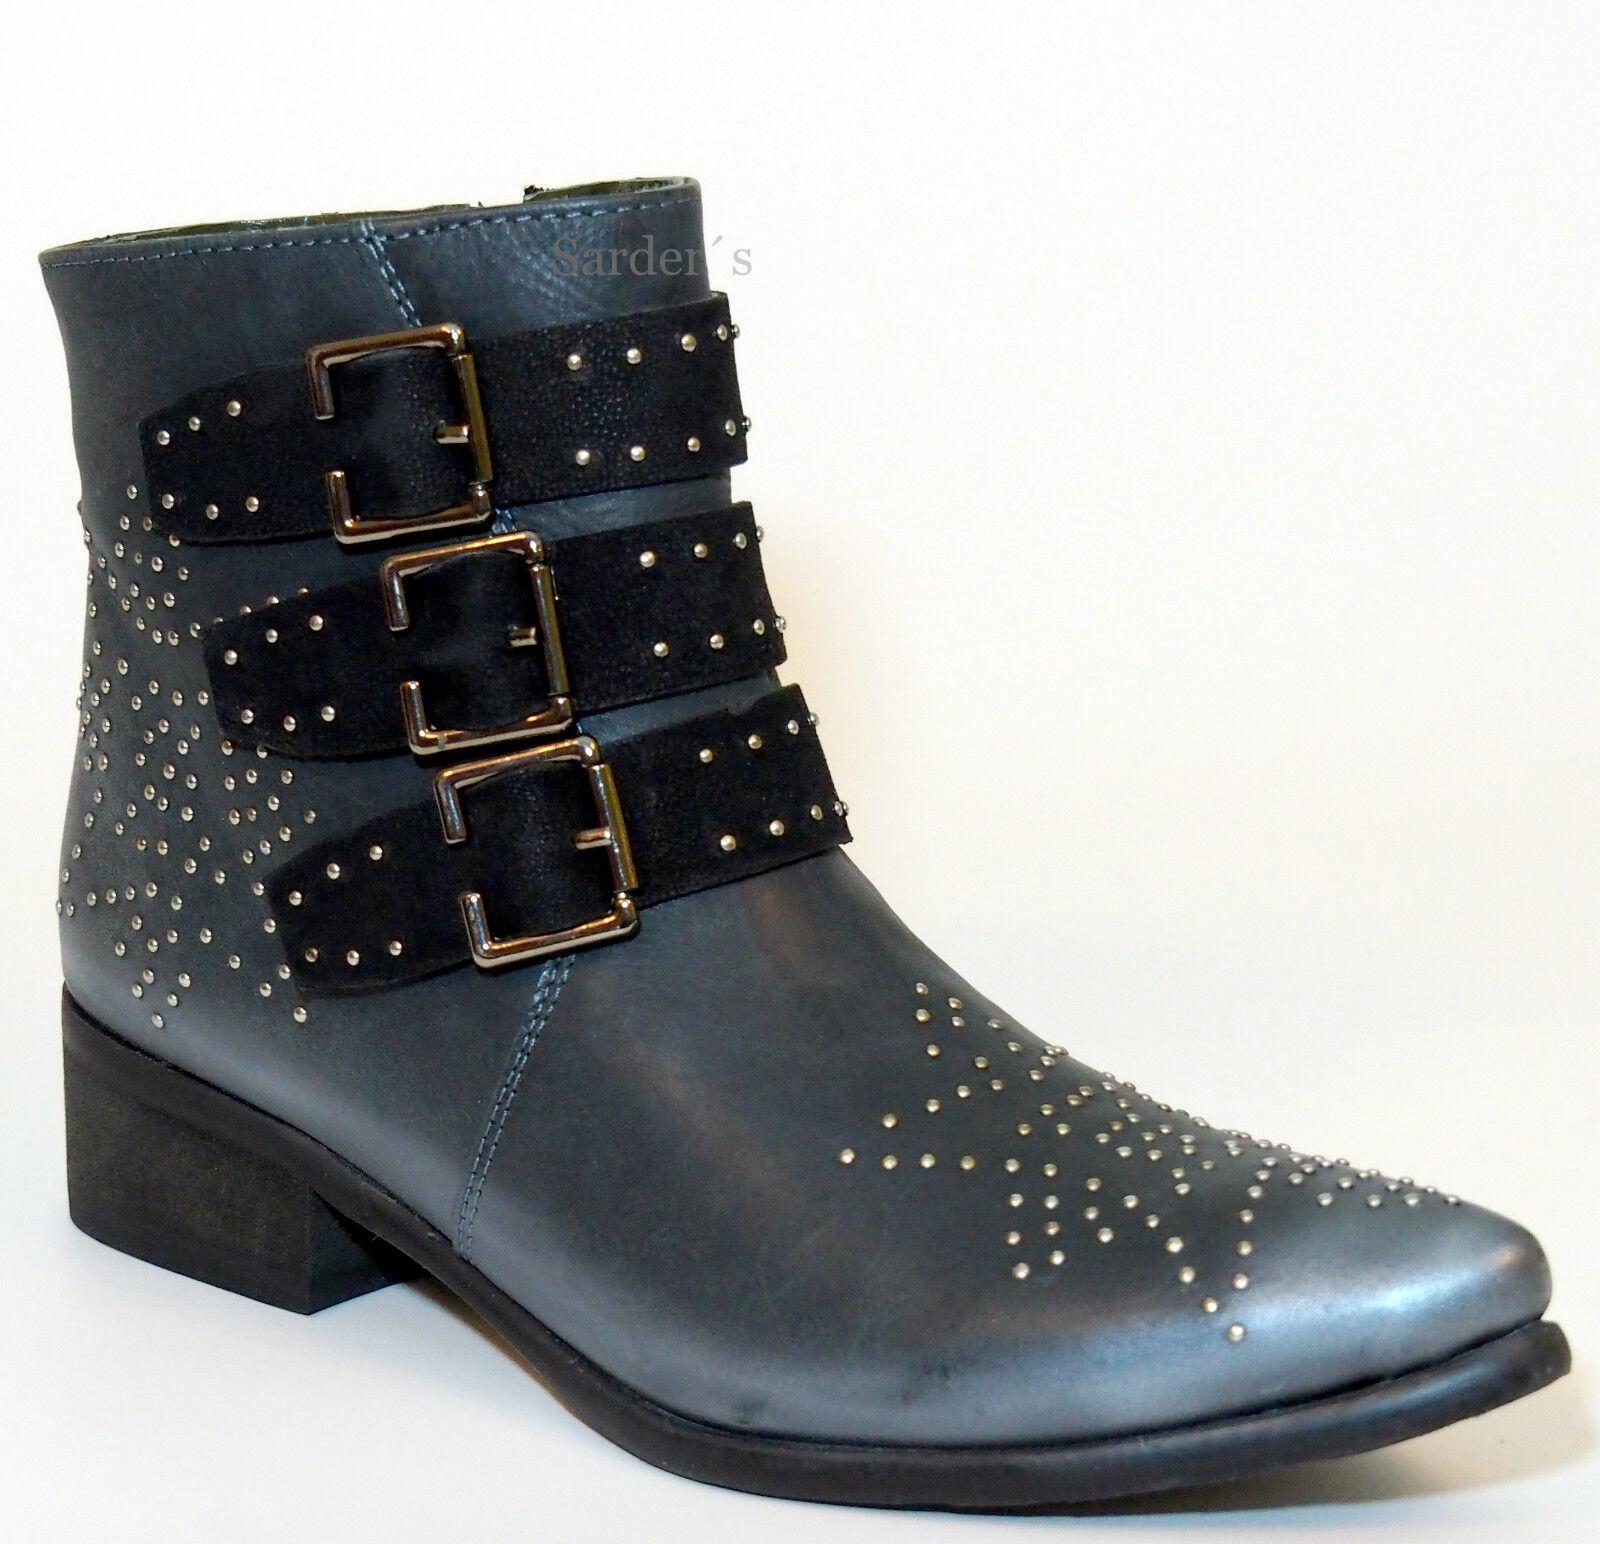 XYXYX Stiefelette 37 Echt- LEDER Schwarz Black Used Vintage Look geile Boots NEU